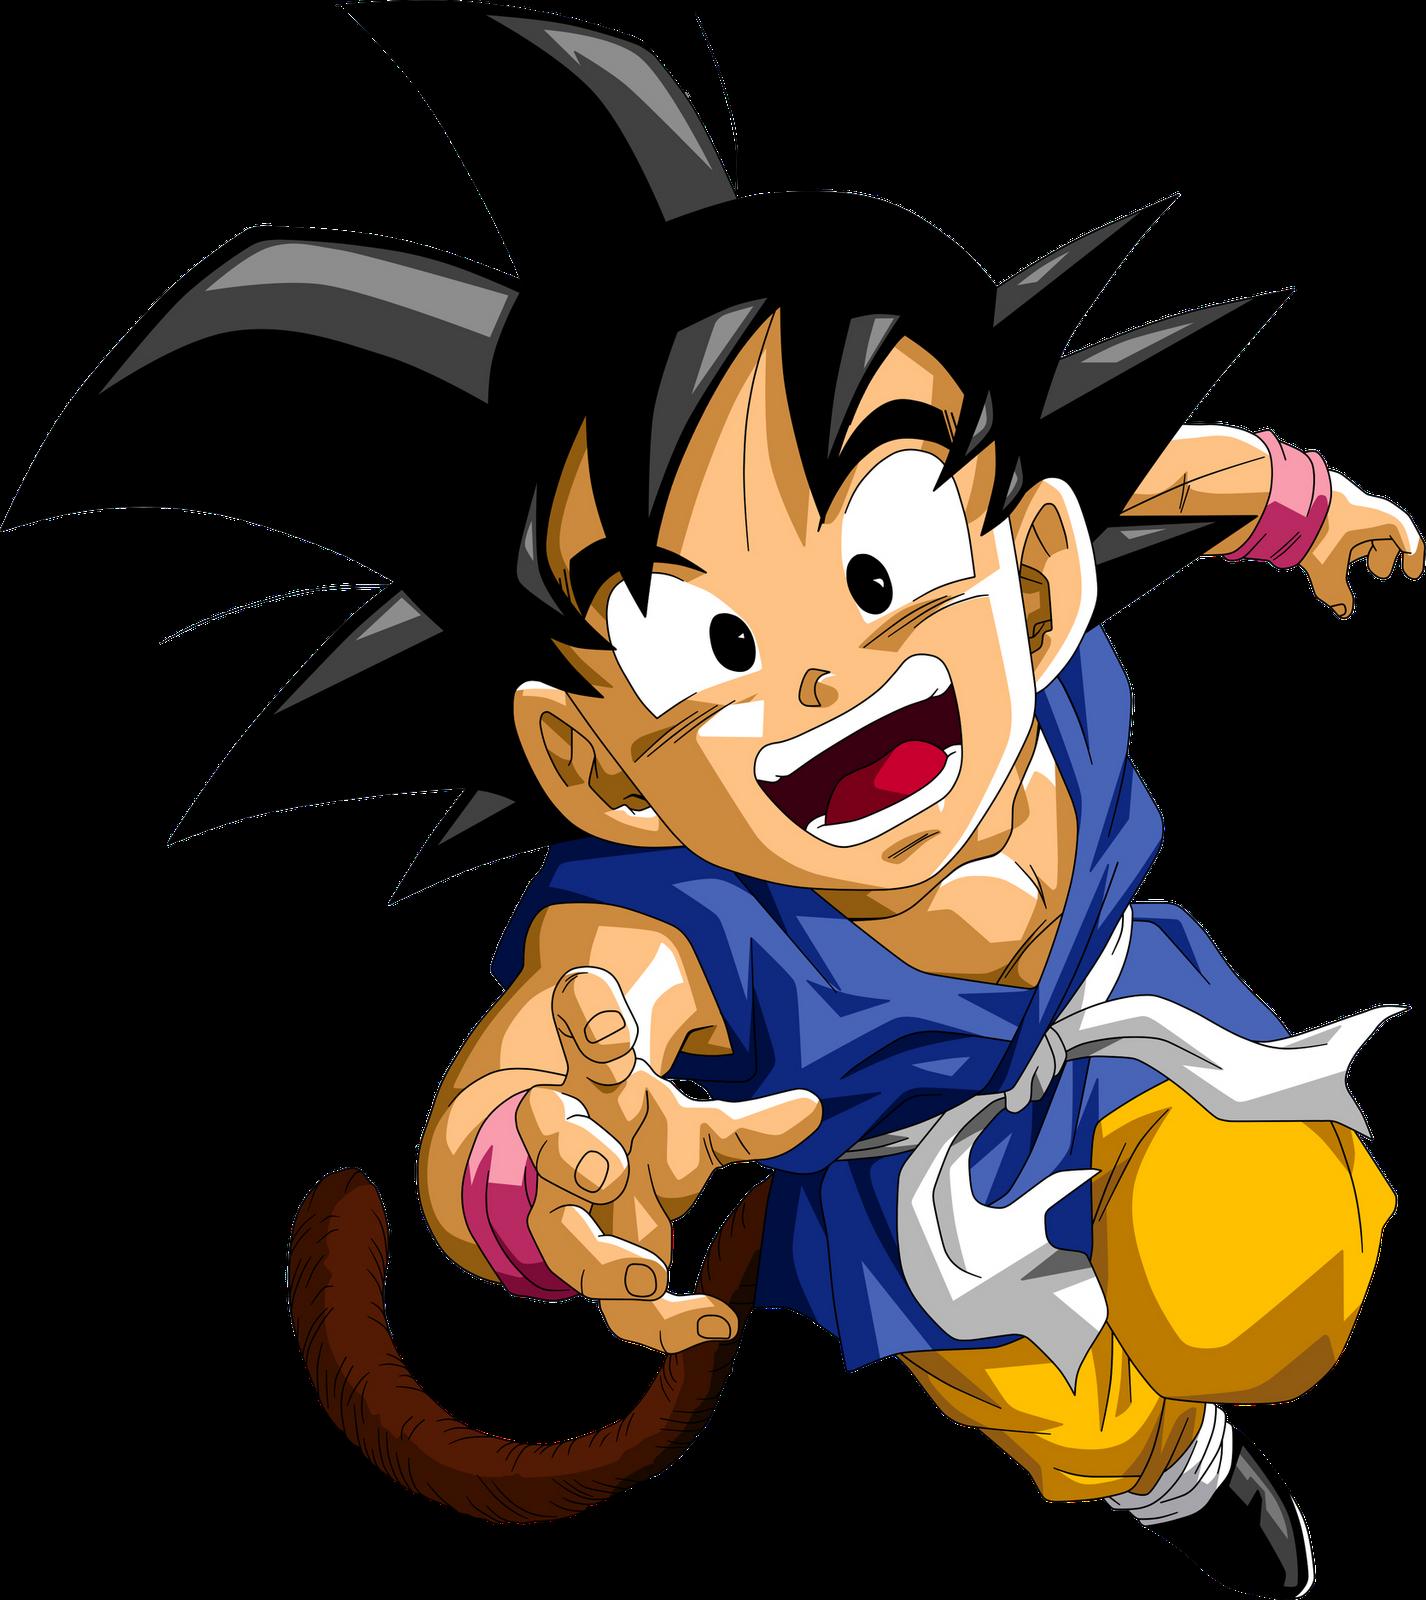 dragon ball kid goku read dragon ball manga online at mangagrounds discuss dragon ball series